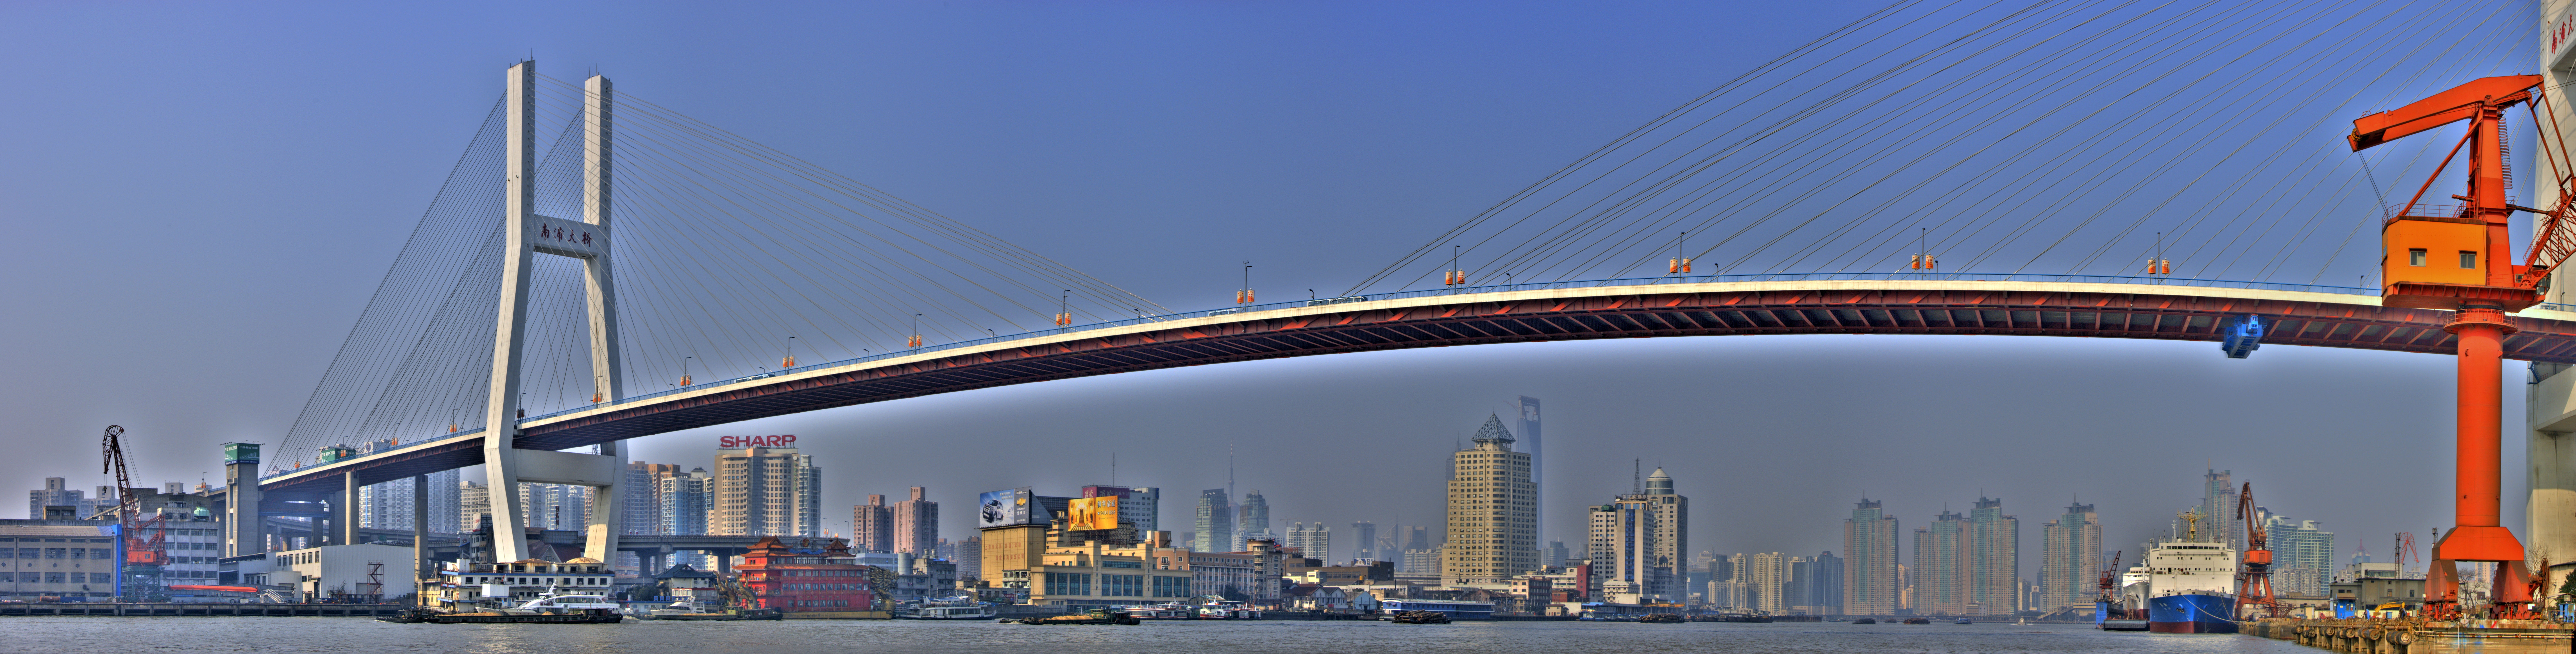 Nanpu_Bridge_Panorama